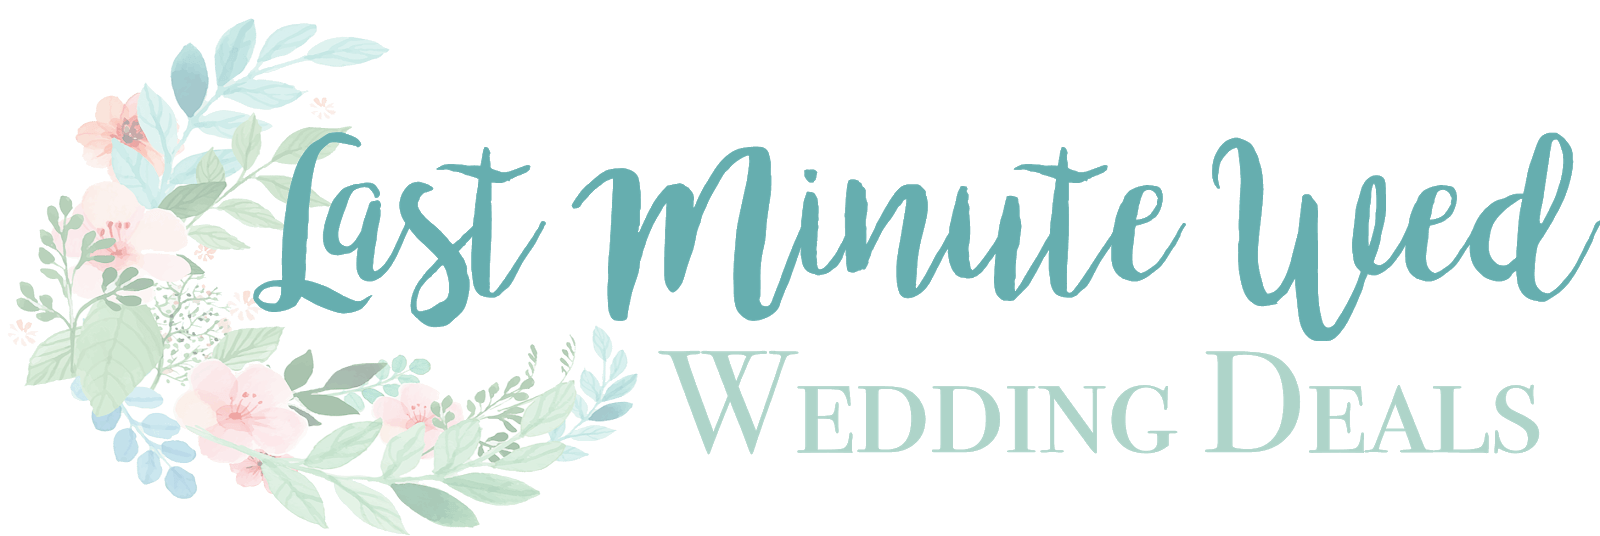 Last Minute Wed